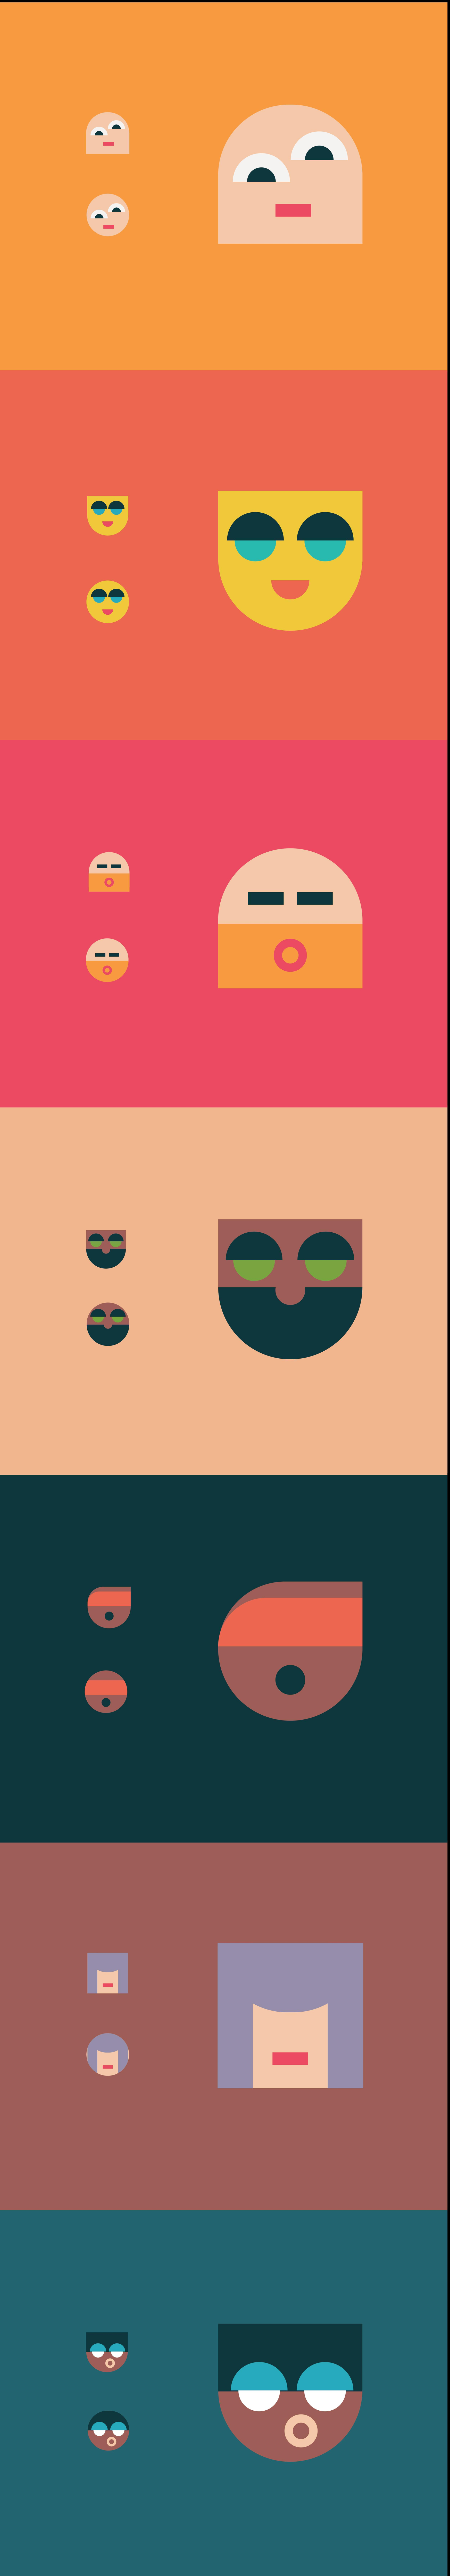 FaceMaker_Grid_gm-08.png